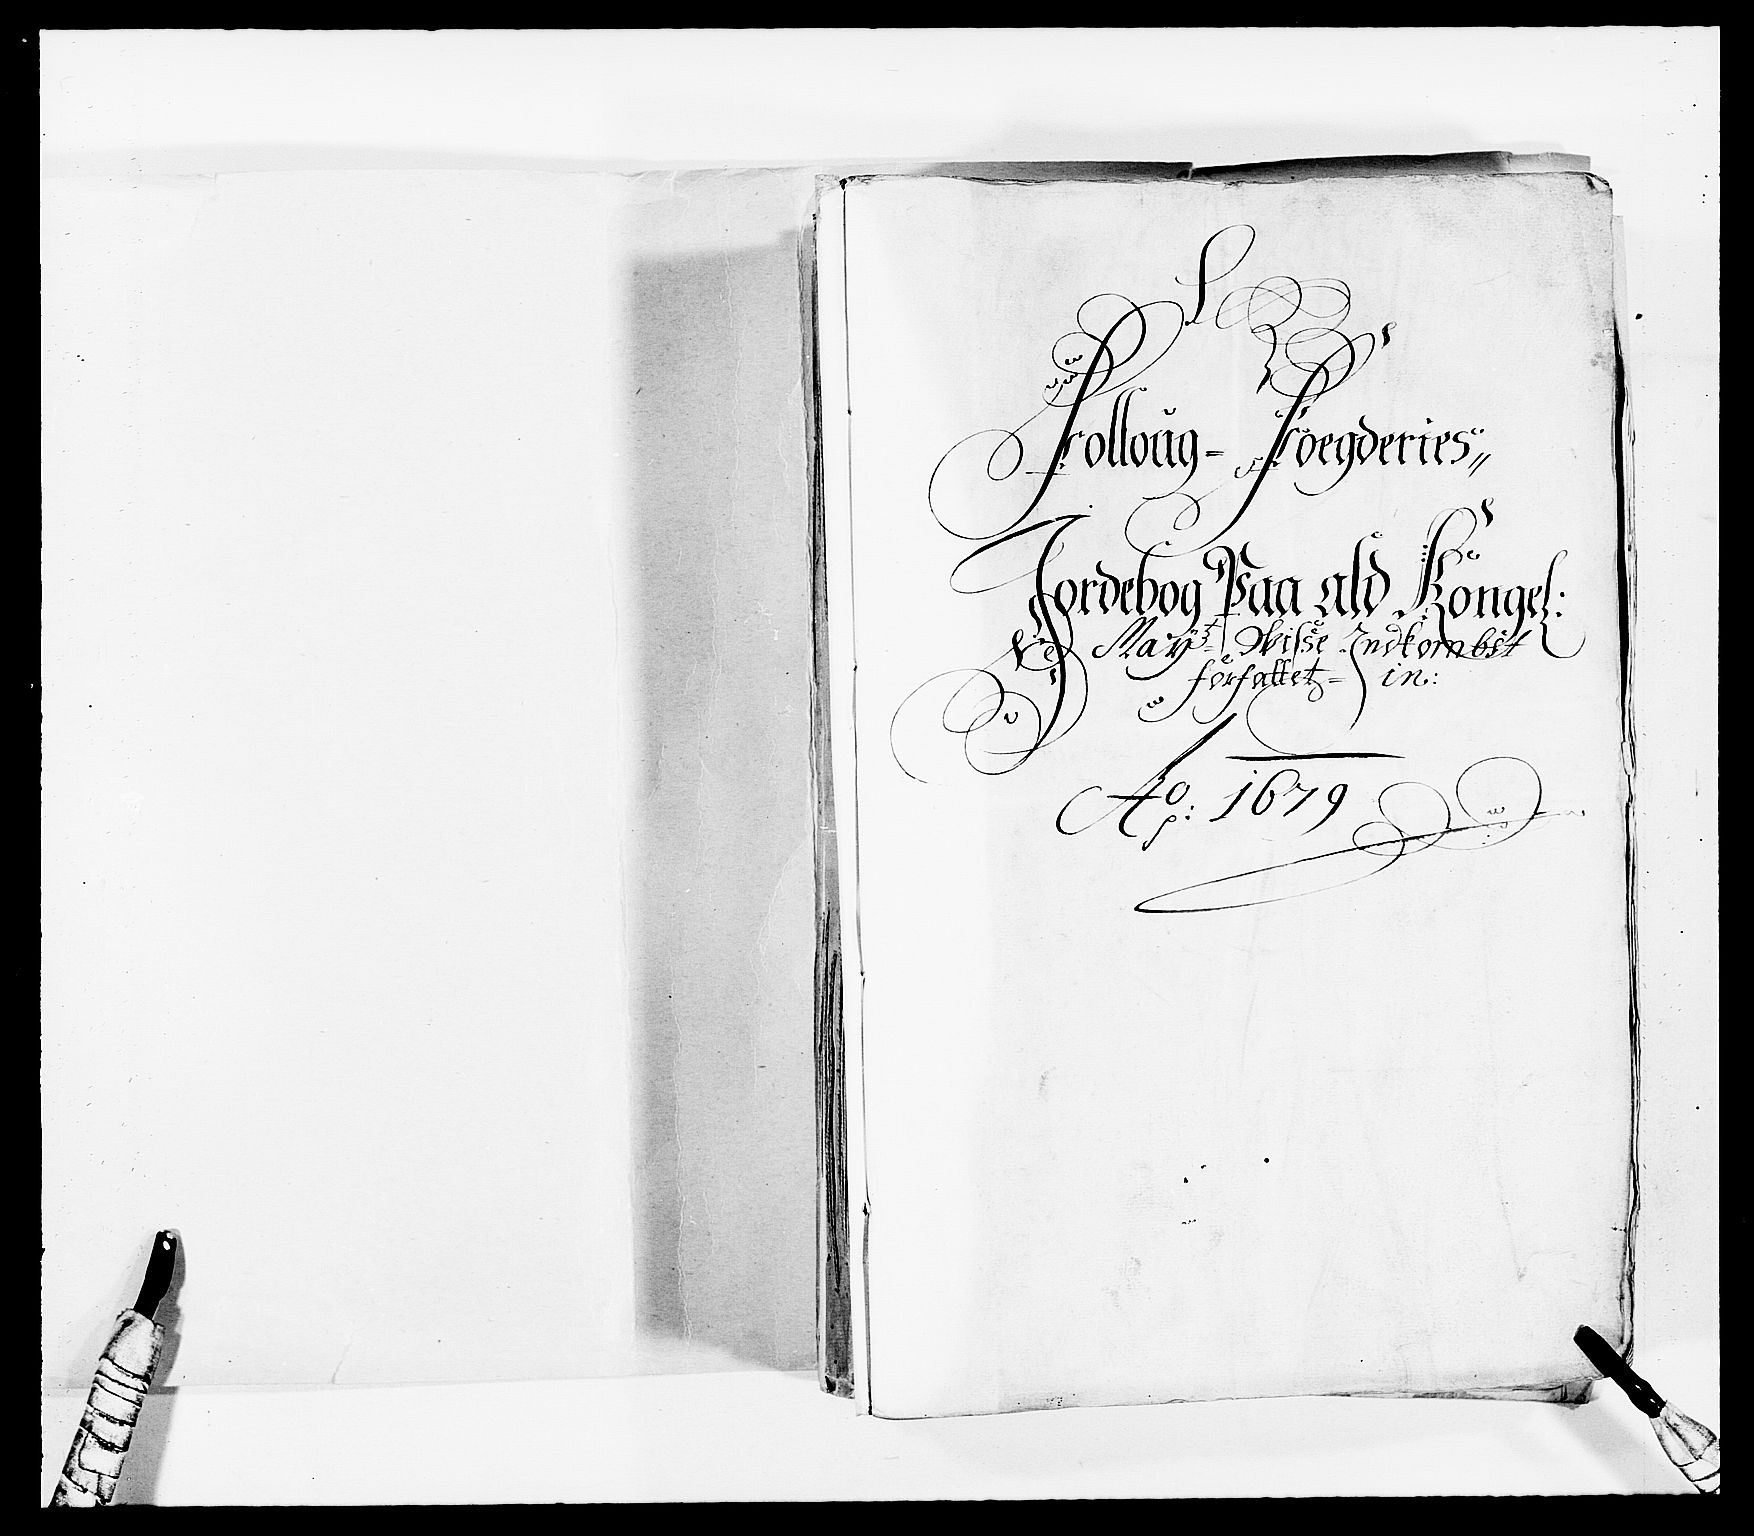 RA, Rentekammeret inntil 1814, Reviderte regnskaper, Fogderegnskap, R09/L0428: Fogderegnskap Follo, 1679, s. 9